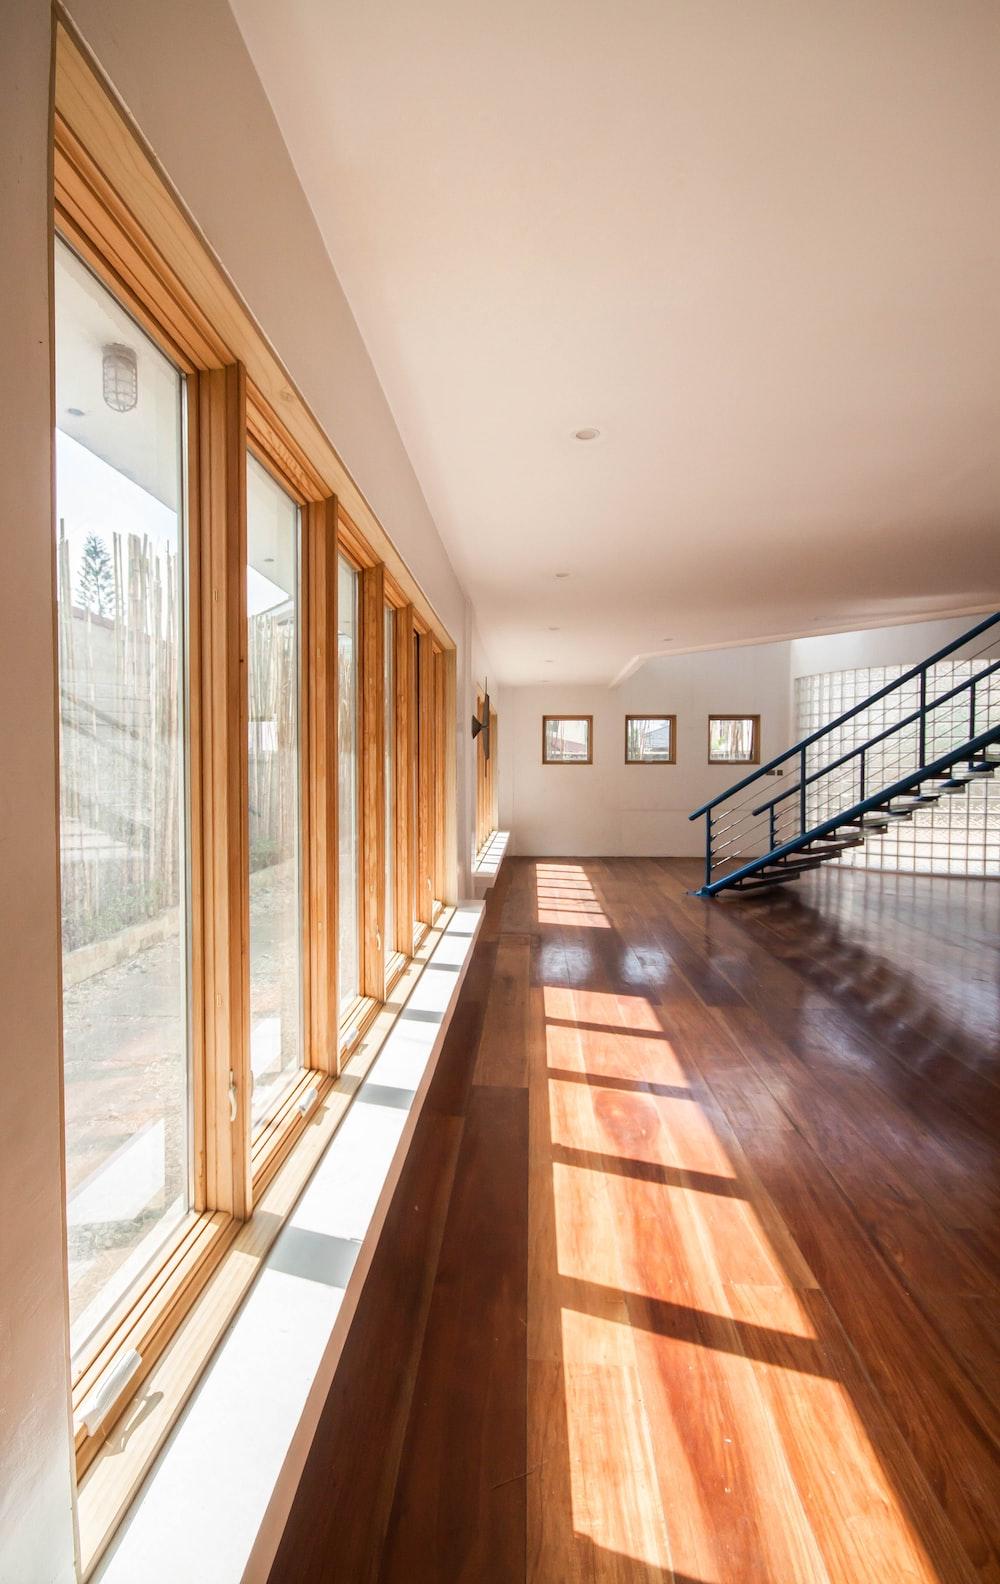 brown wooden parquet floor with glass windows